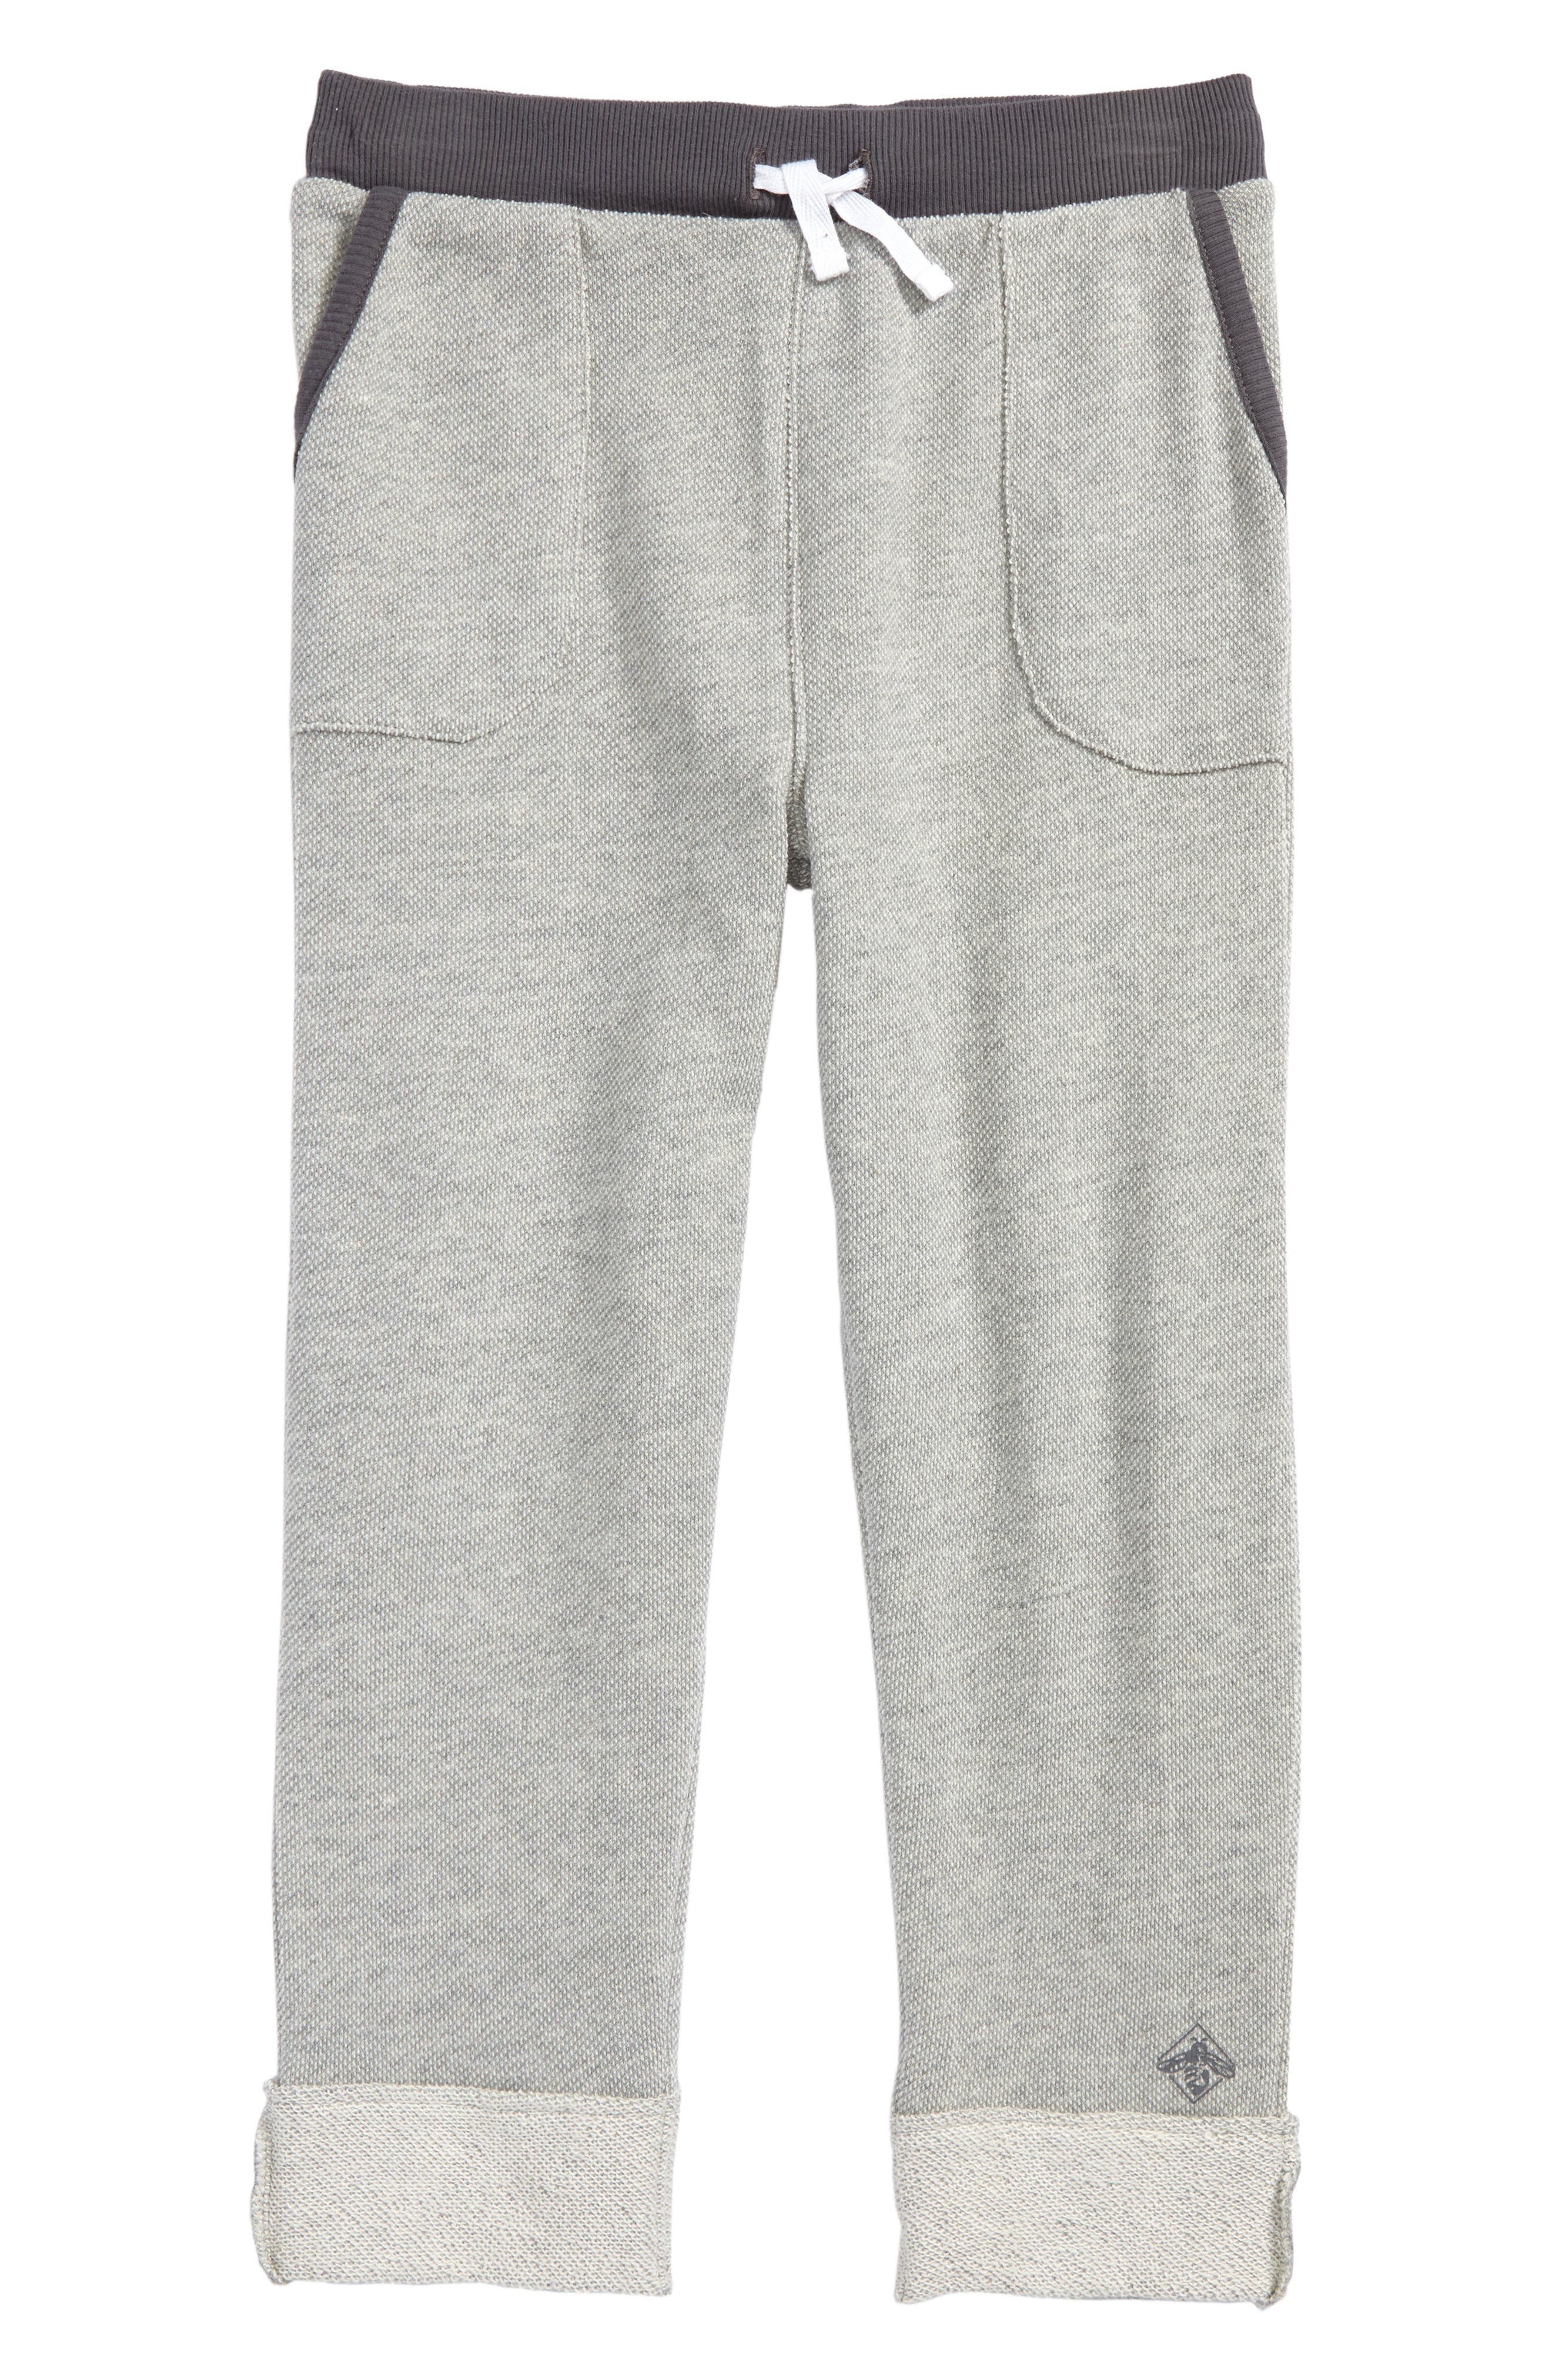 Organic Cotton Sweatpants,                             Main thumbnail 1, color,                             050